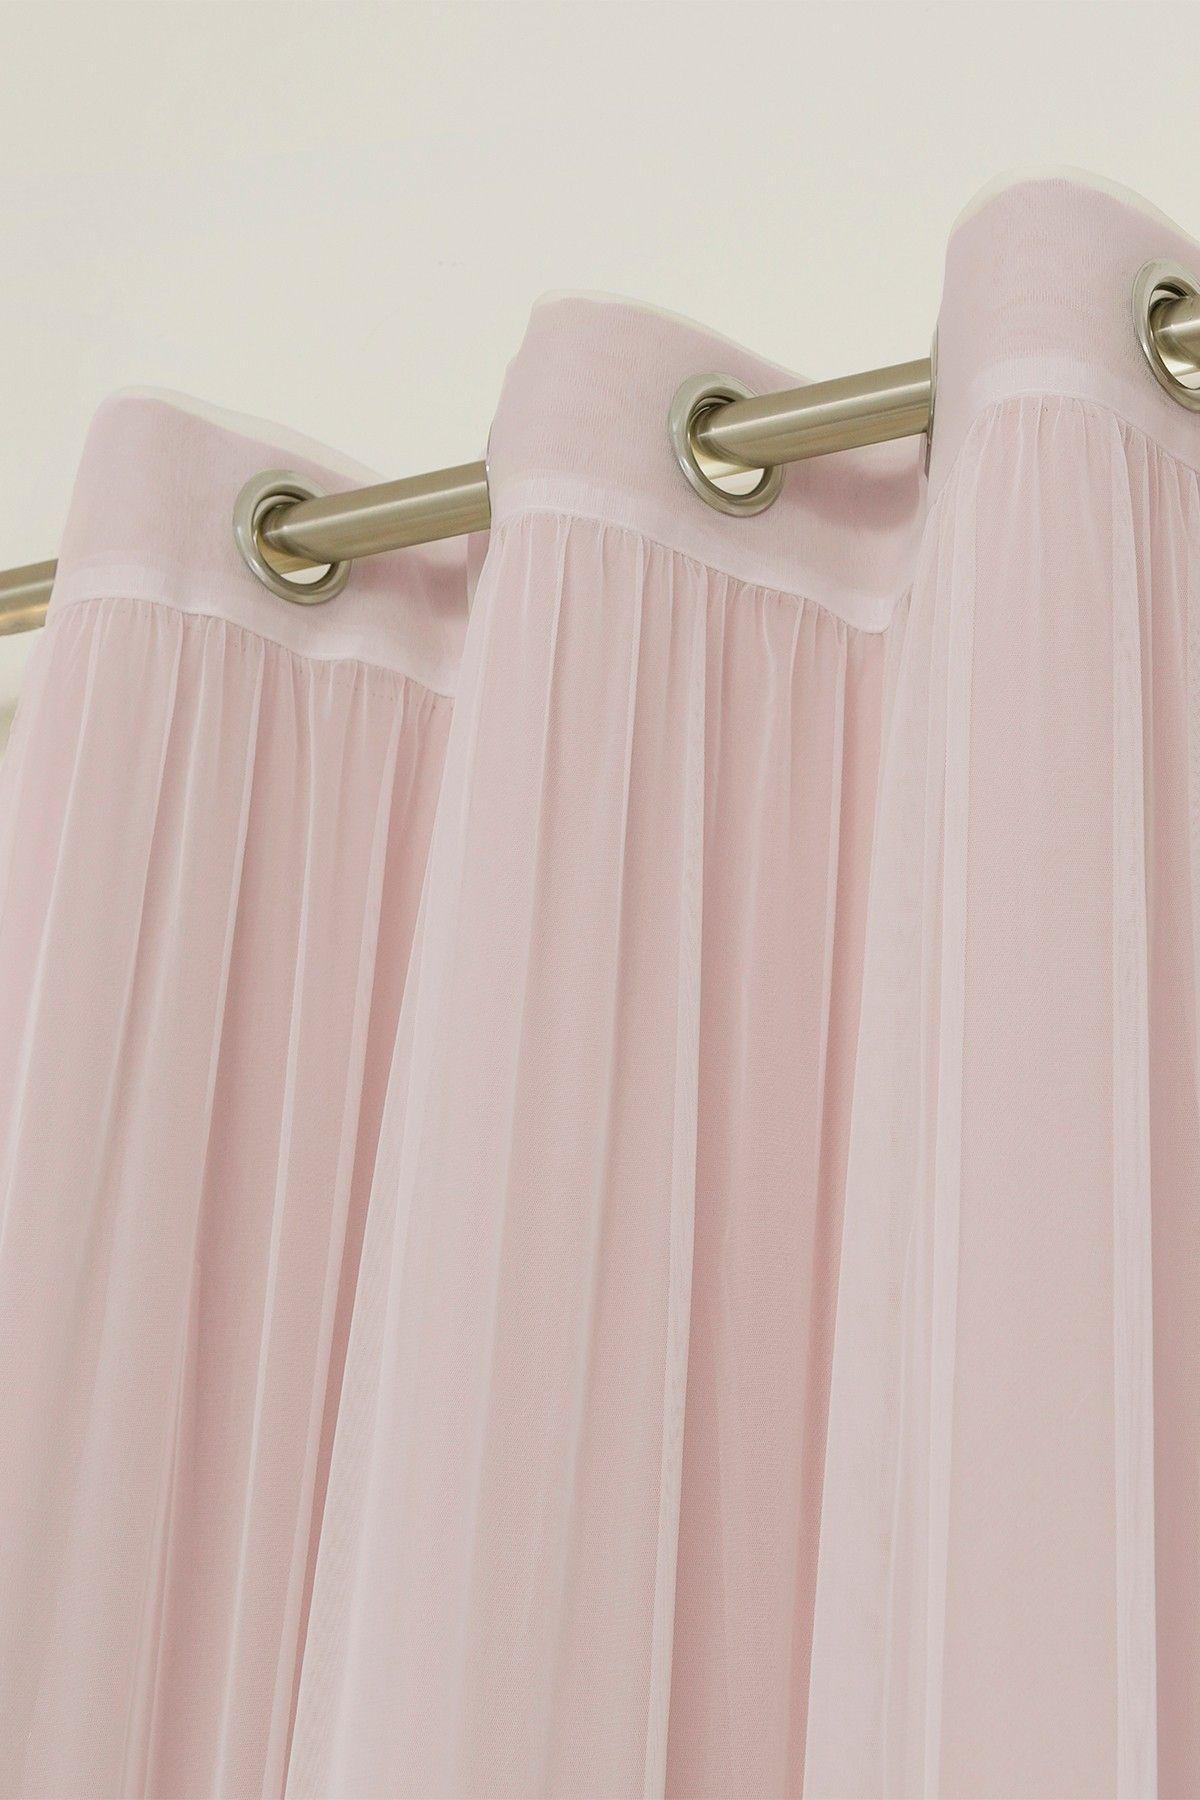 Inc faux silk blackout curtain set of 2 light pink hautelook - Mix Match Tulle Sheer Blackout 4 Piece Curtain Set Blush Pink By